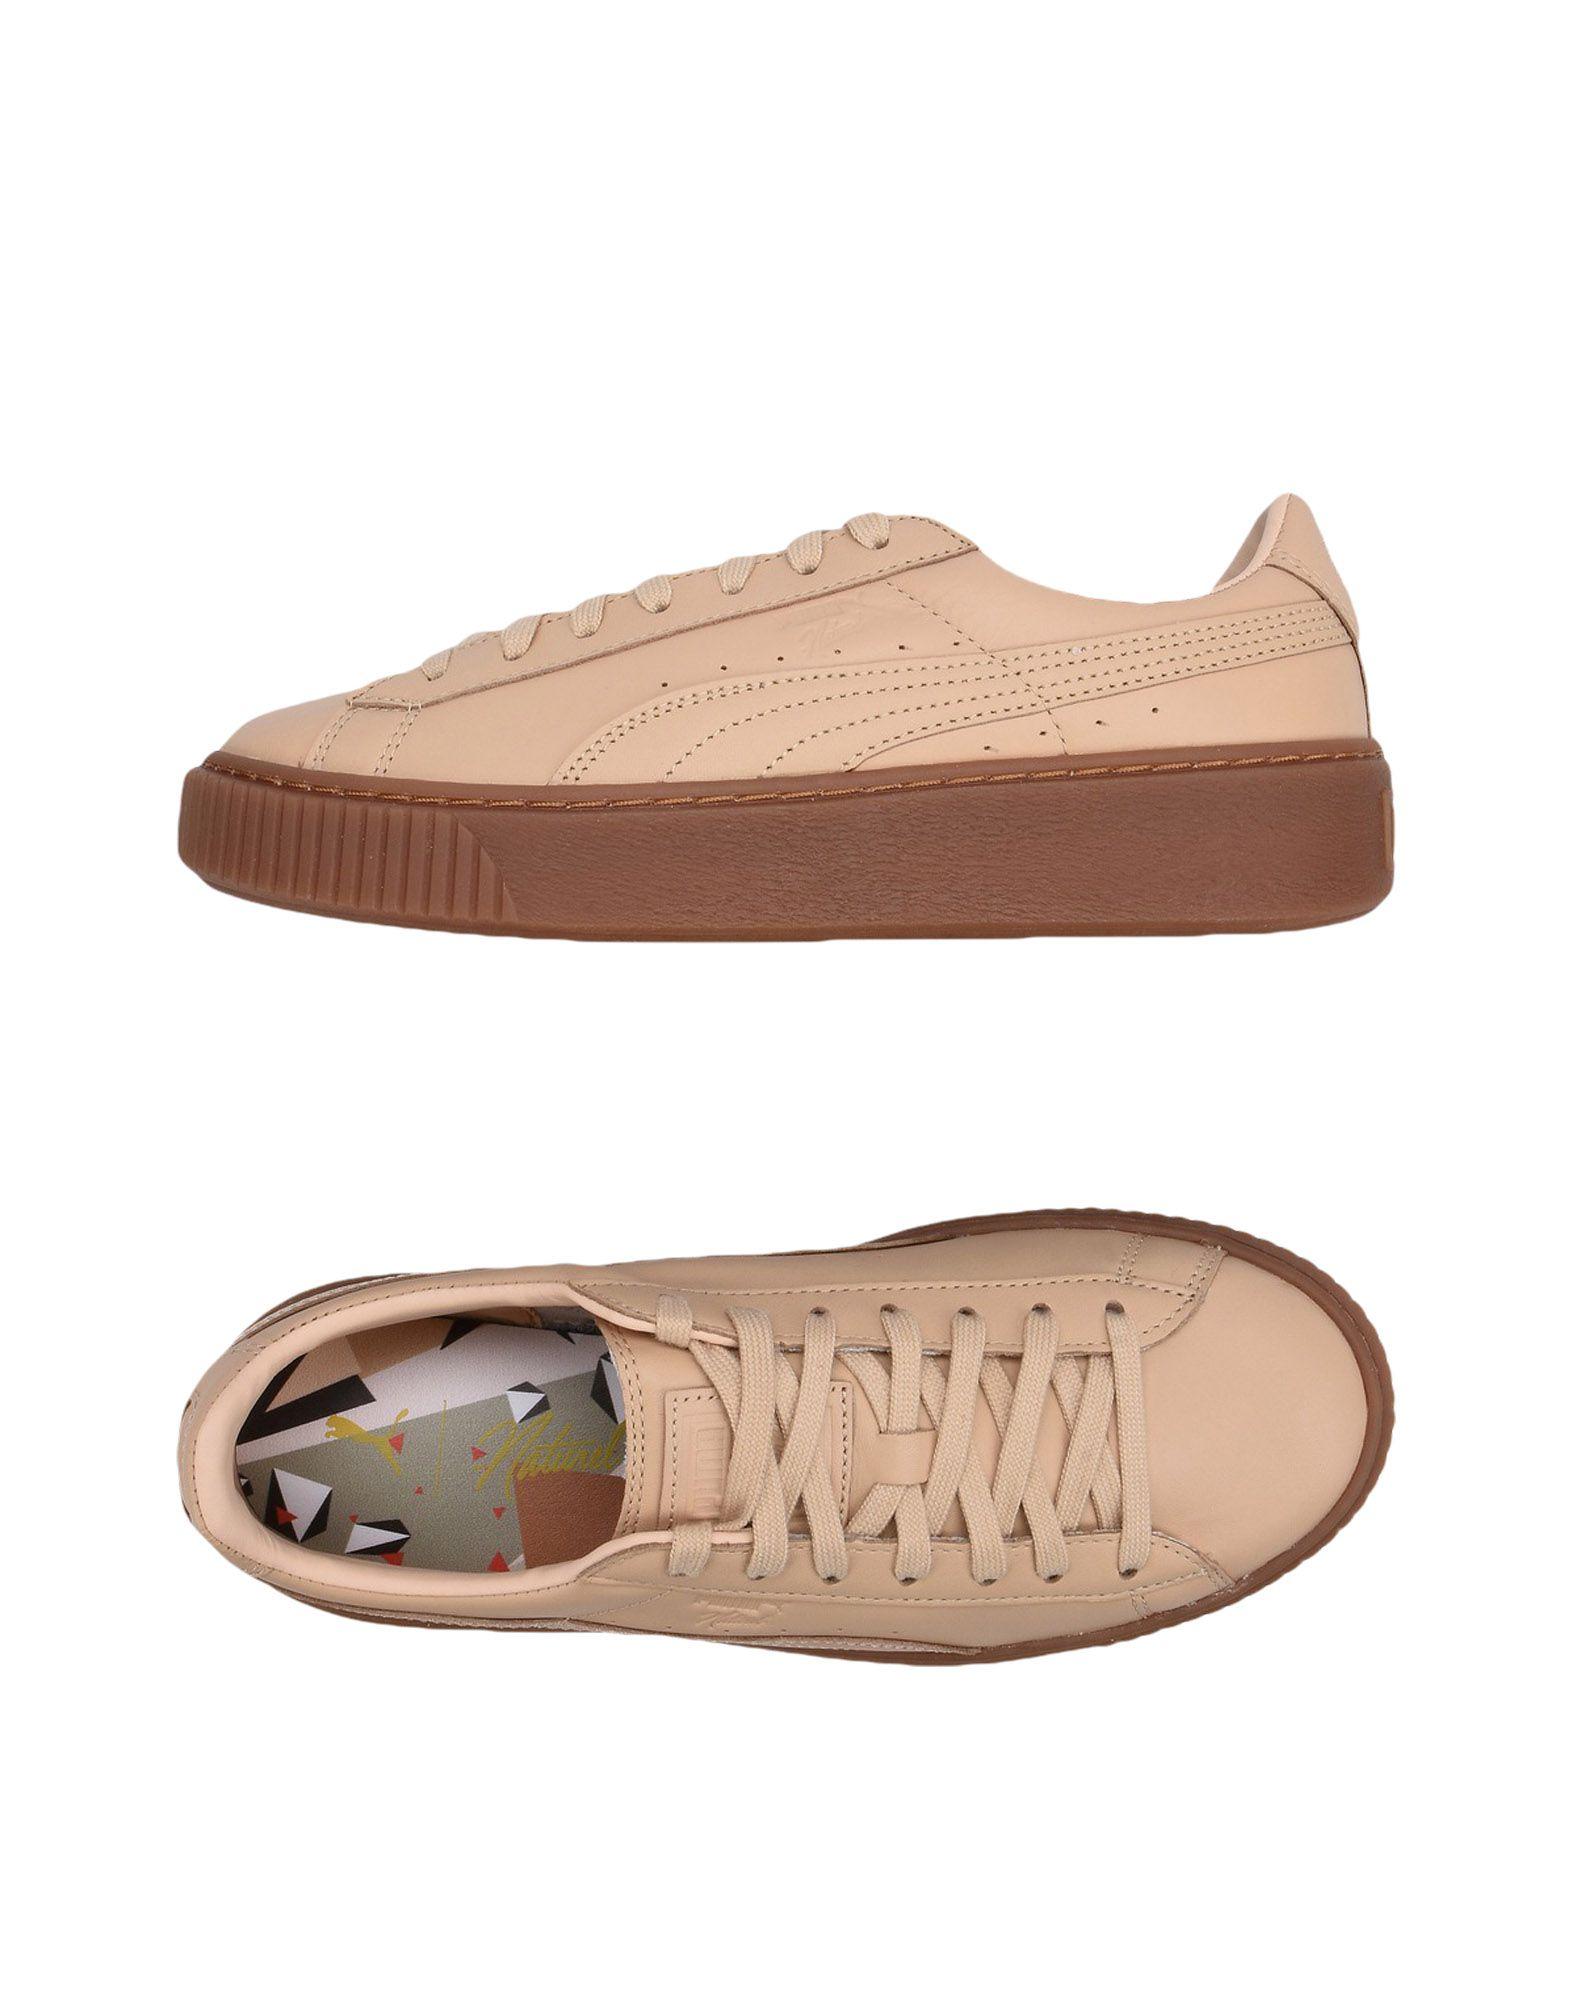 Sneakers Puma  Platform Veg - Femme - Sneakers Puma sur